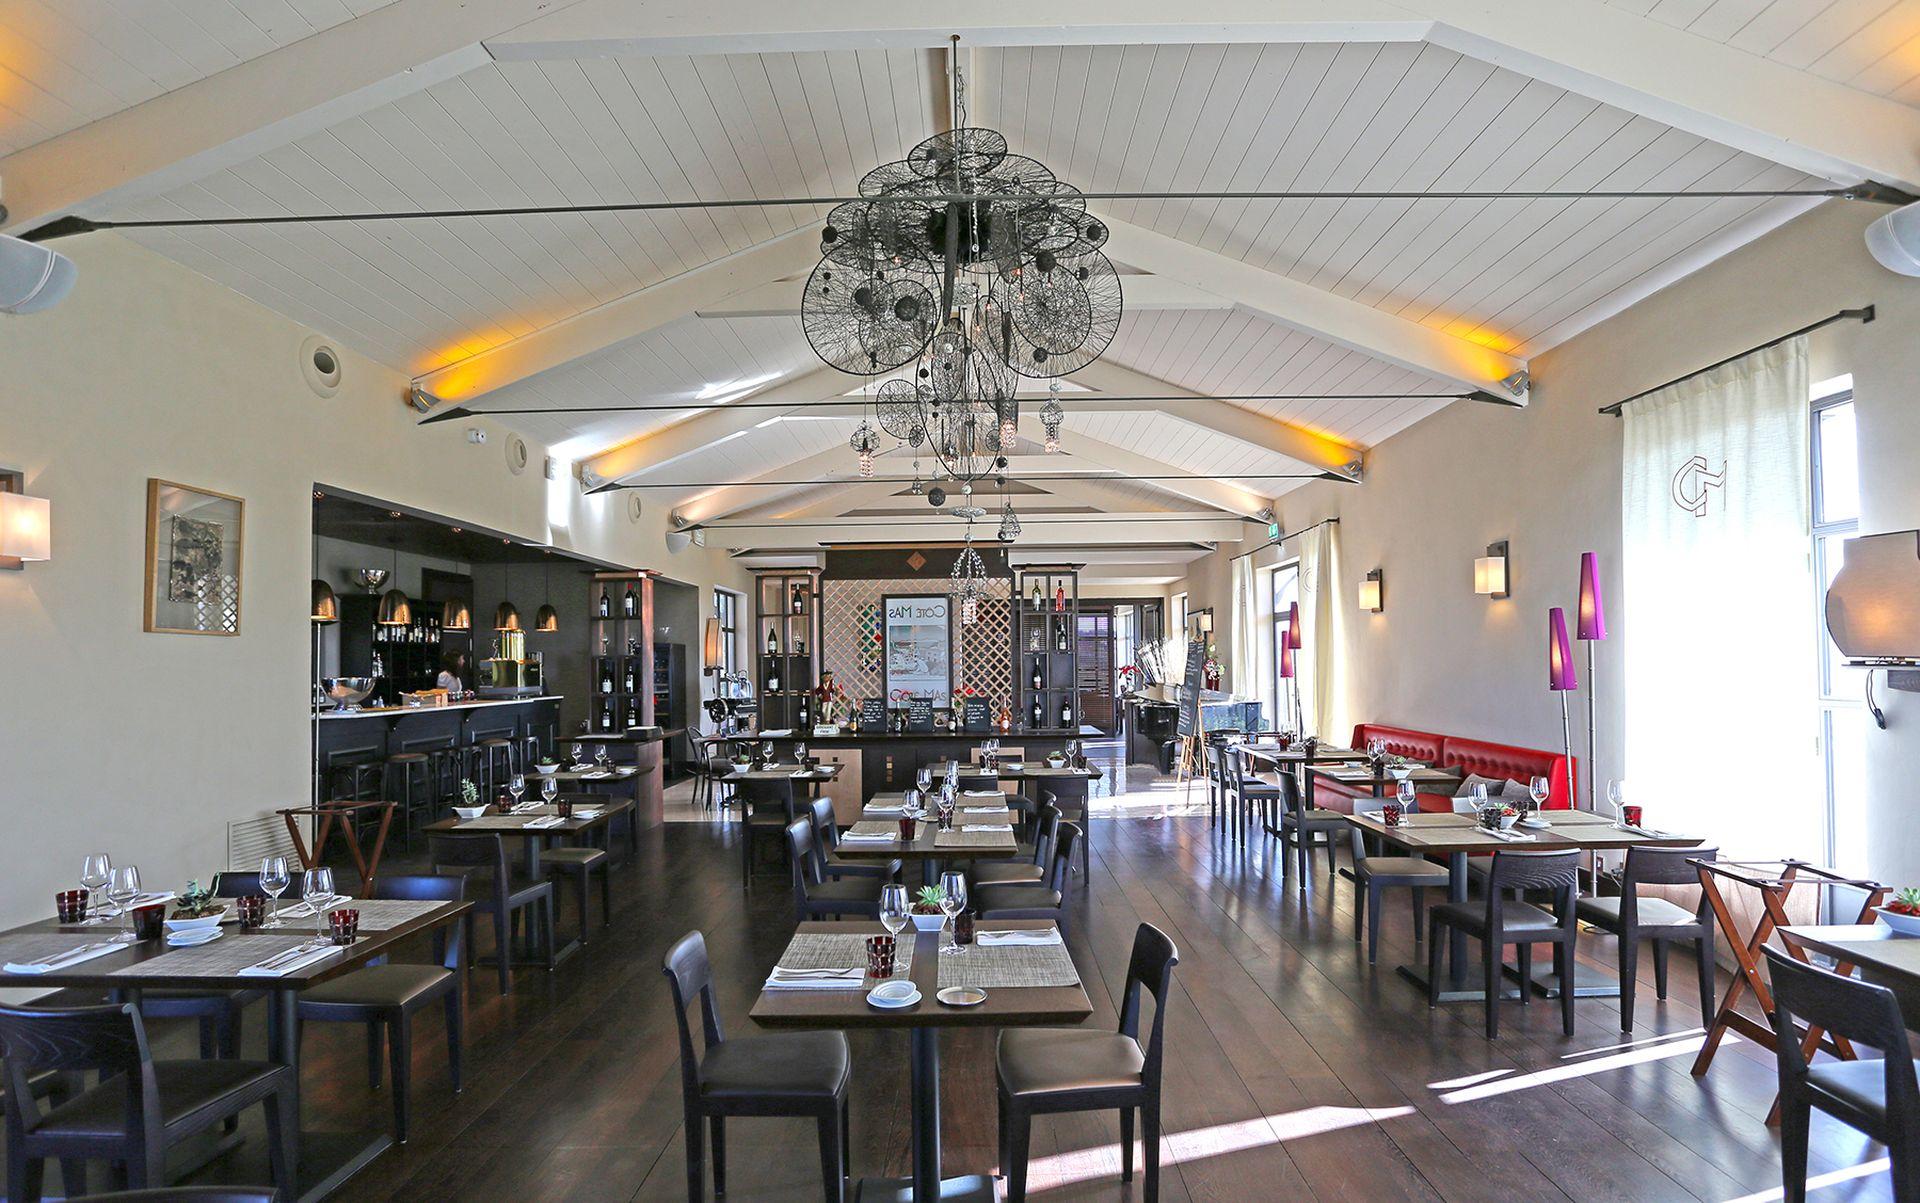 Salle de Restaurant Paul Mas